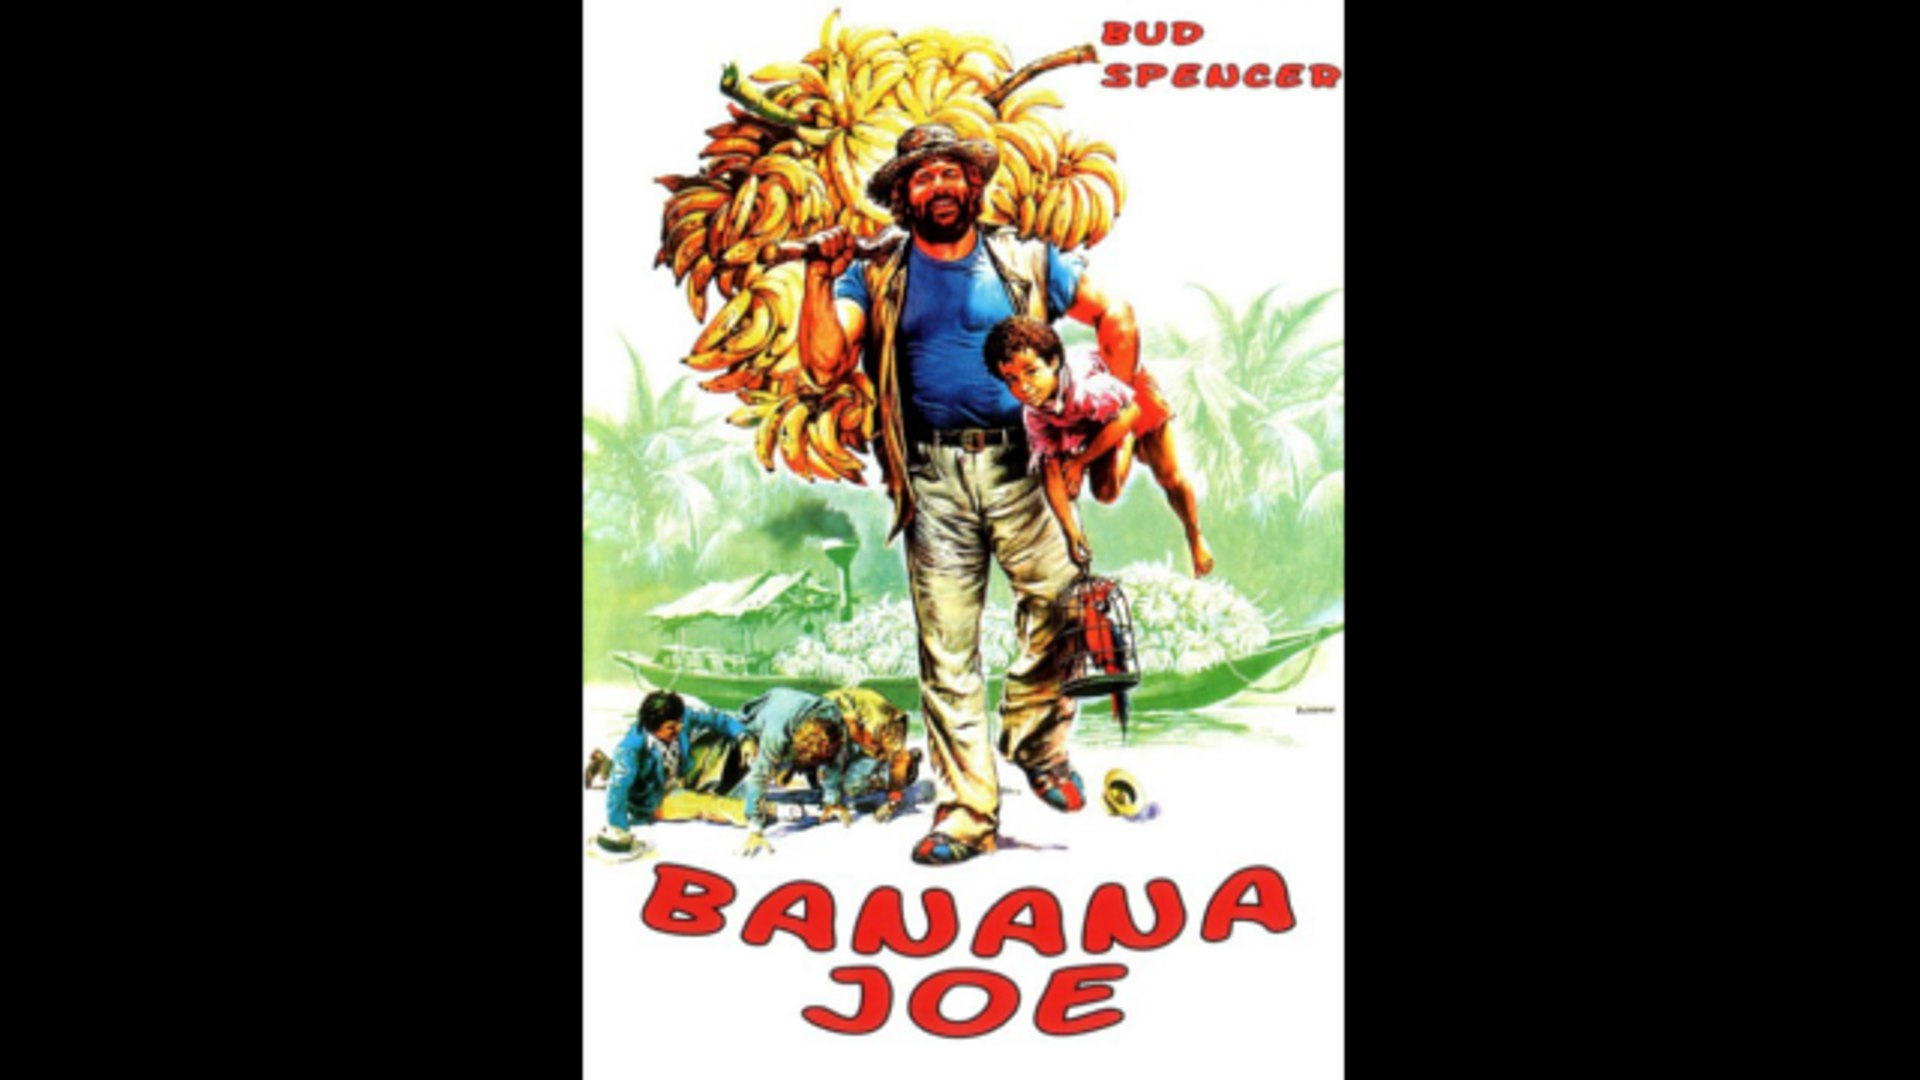 Banana Joe Secondo Tempo Bud Spencer Video Dailymotion